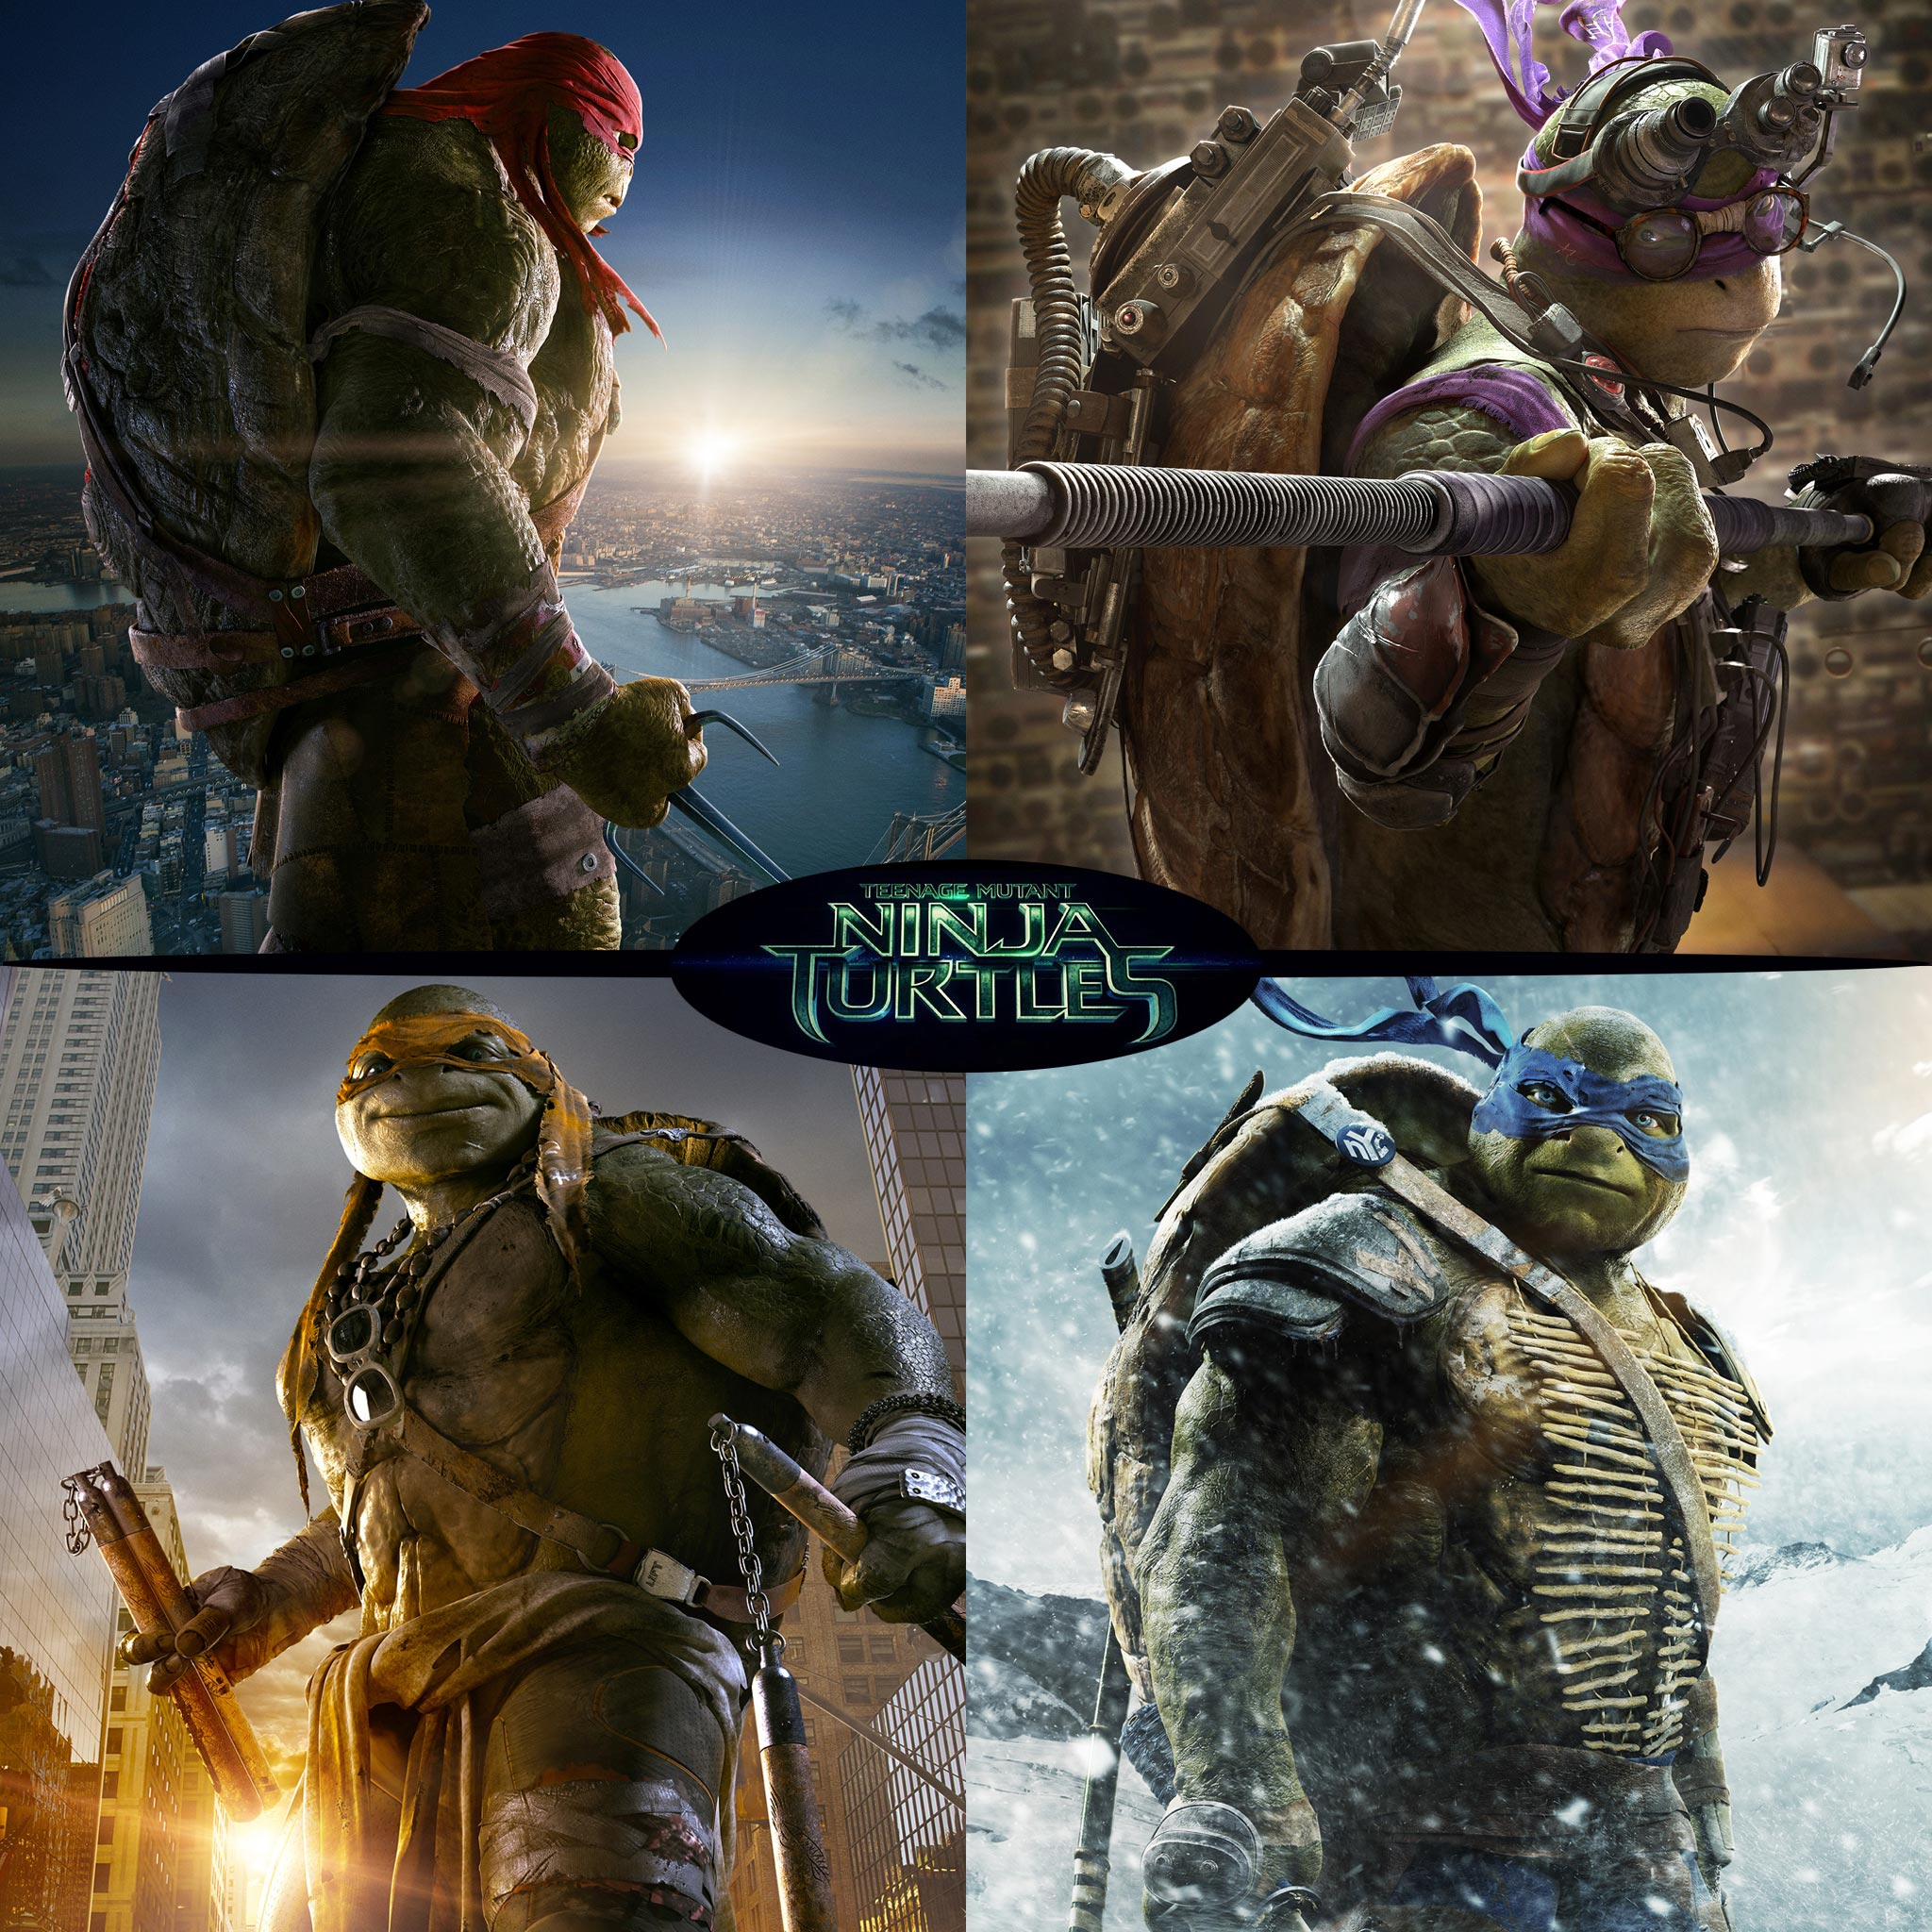 Teenage Mutant Ninja Turtles Tmnt 2014 Hd Desktop Iphone Ipad Wallpapers